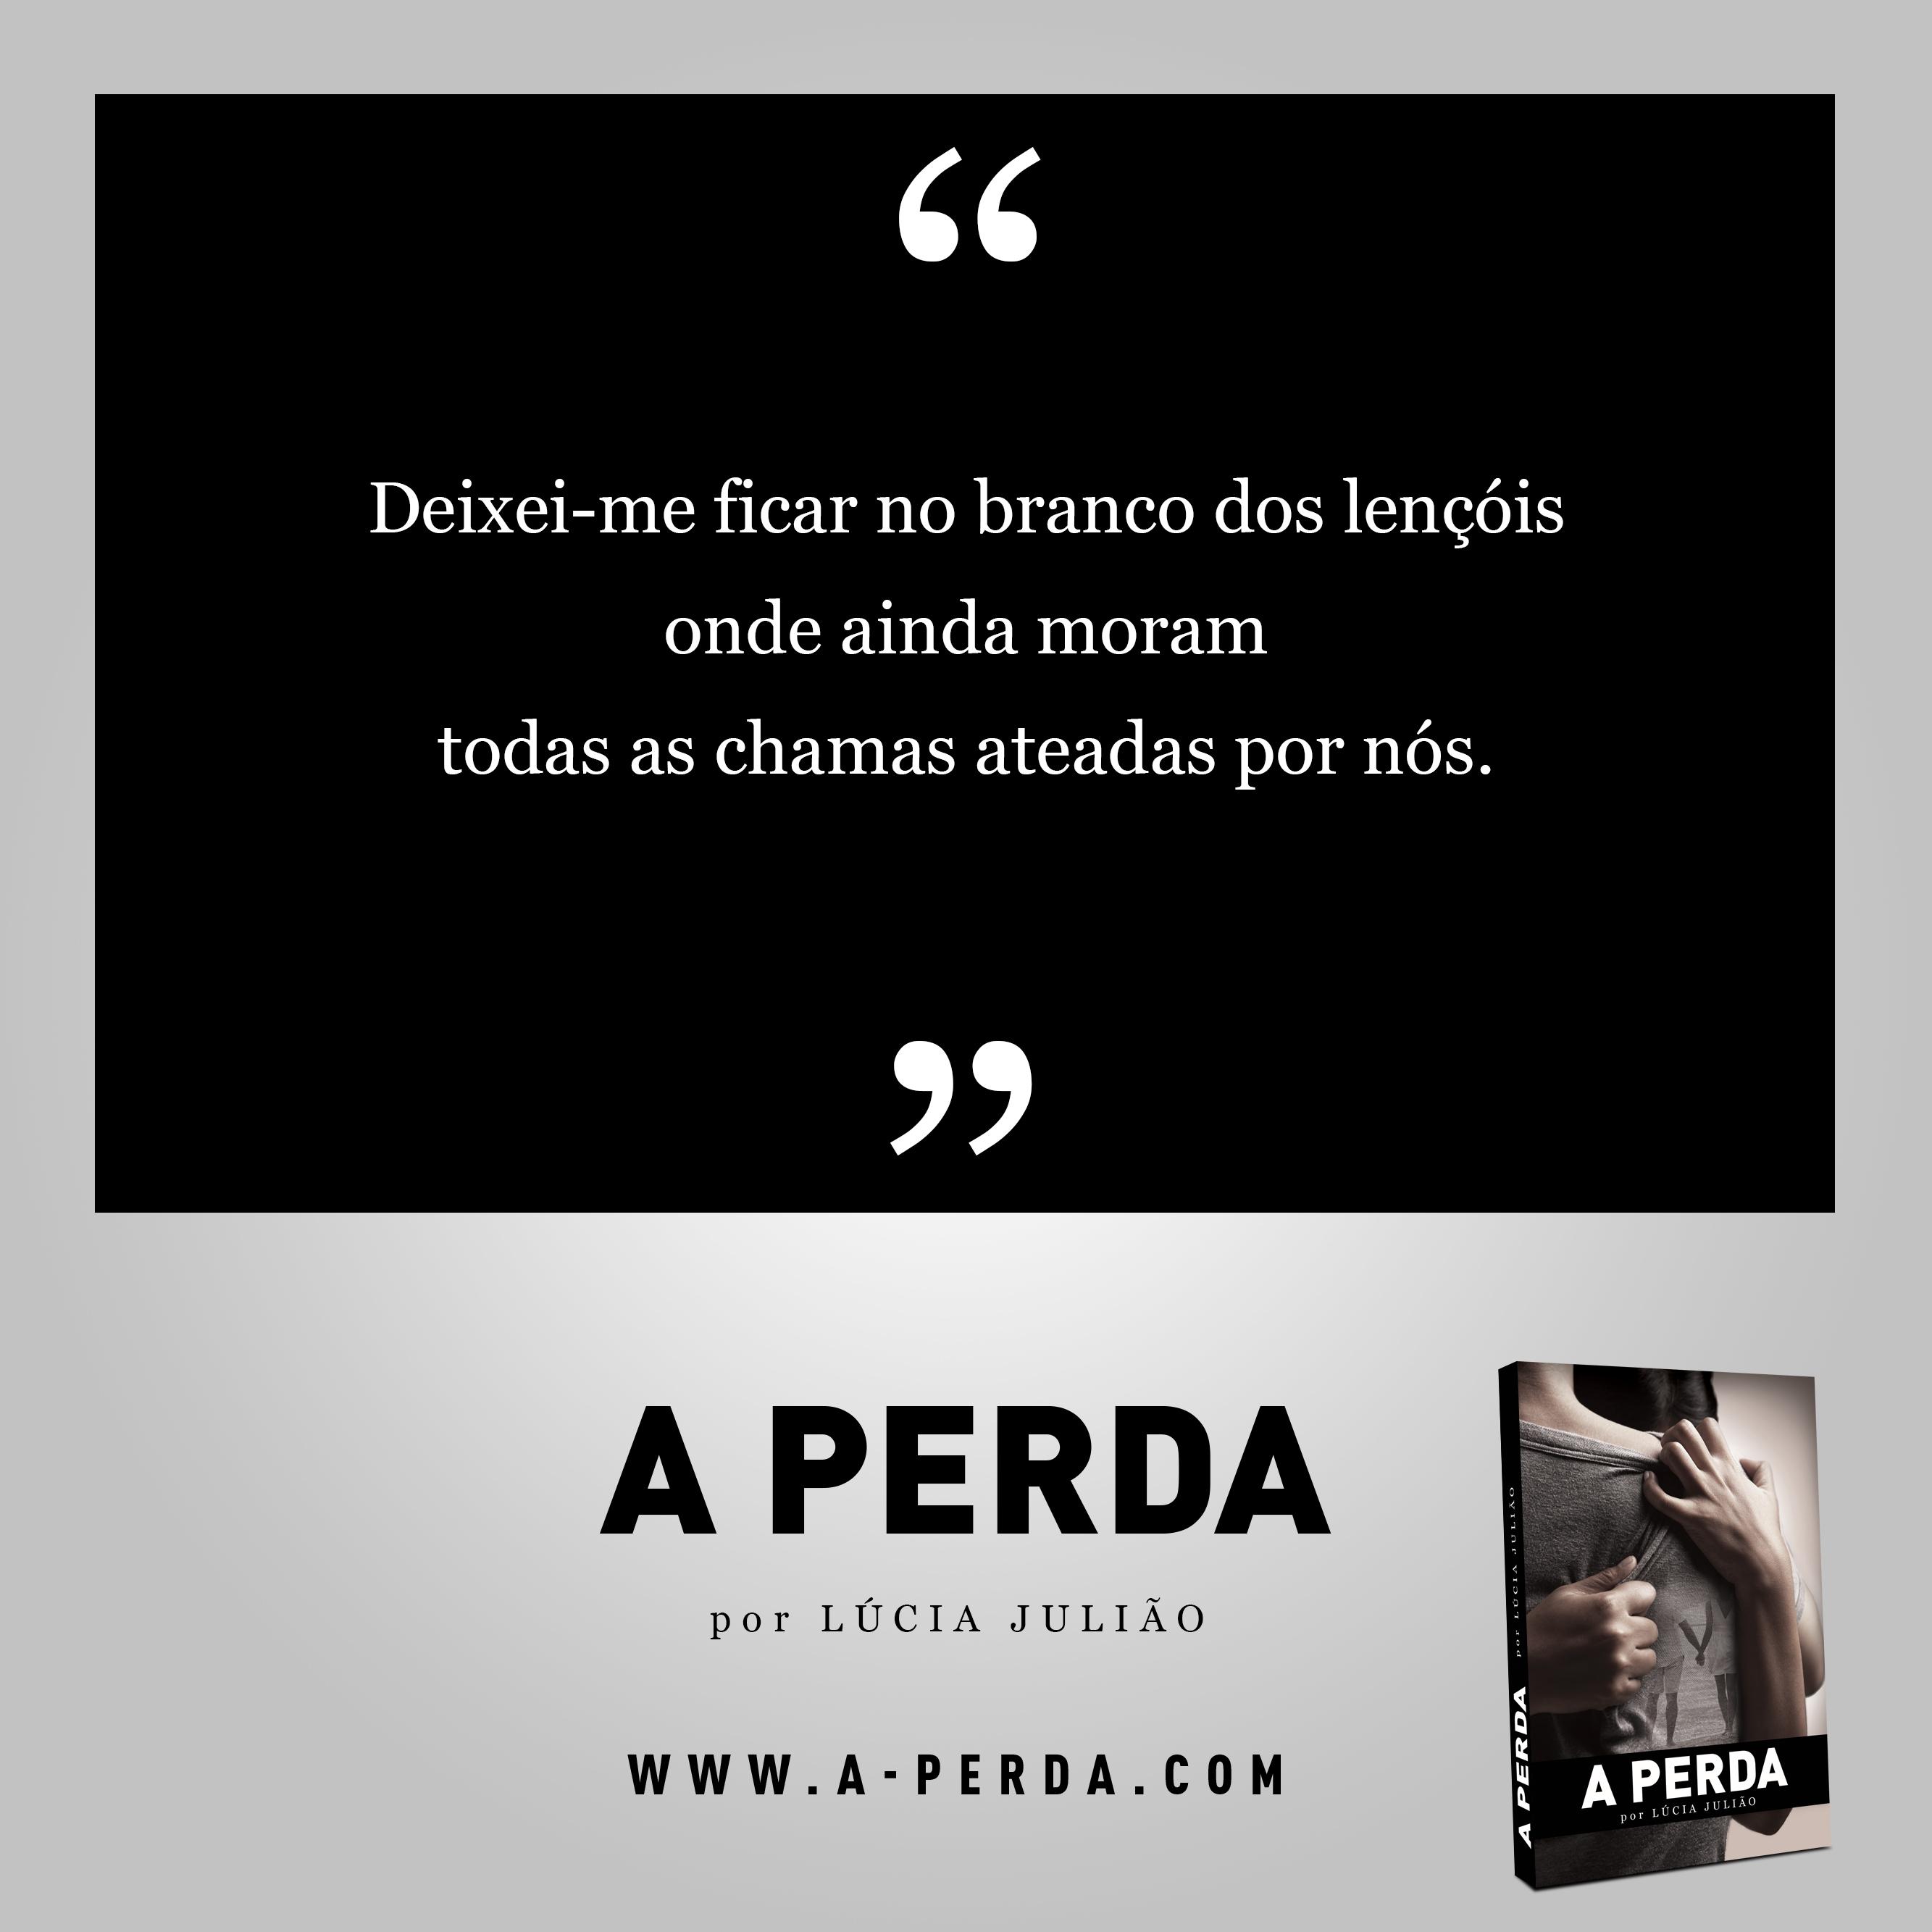 033-capitulo-51-livro-a-Perda-de-Lucia-Juliao-Instagram